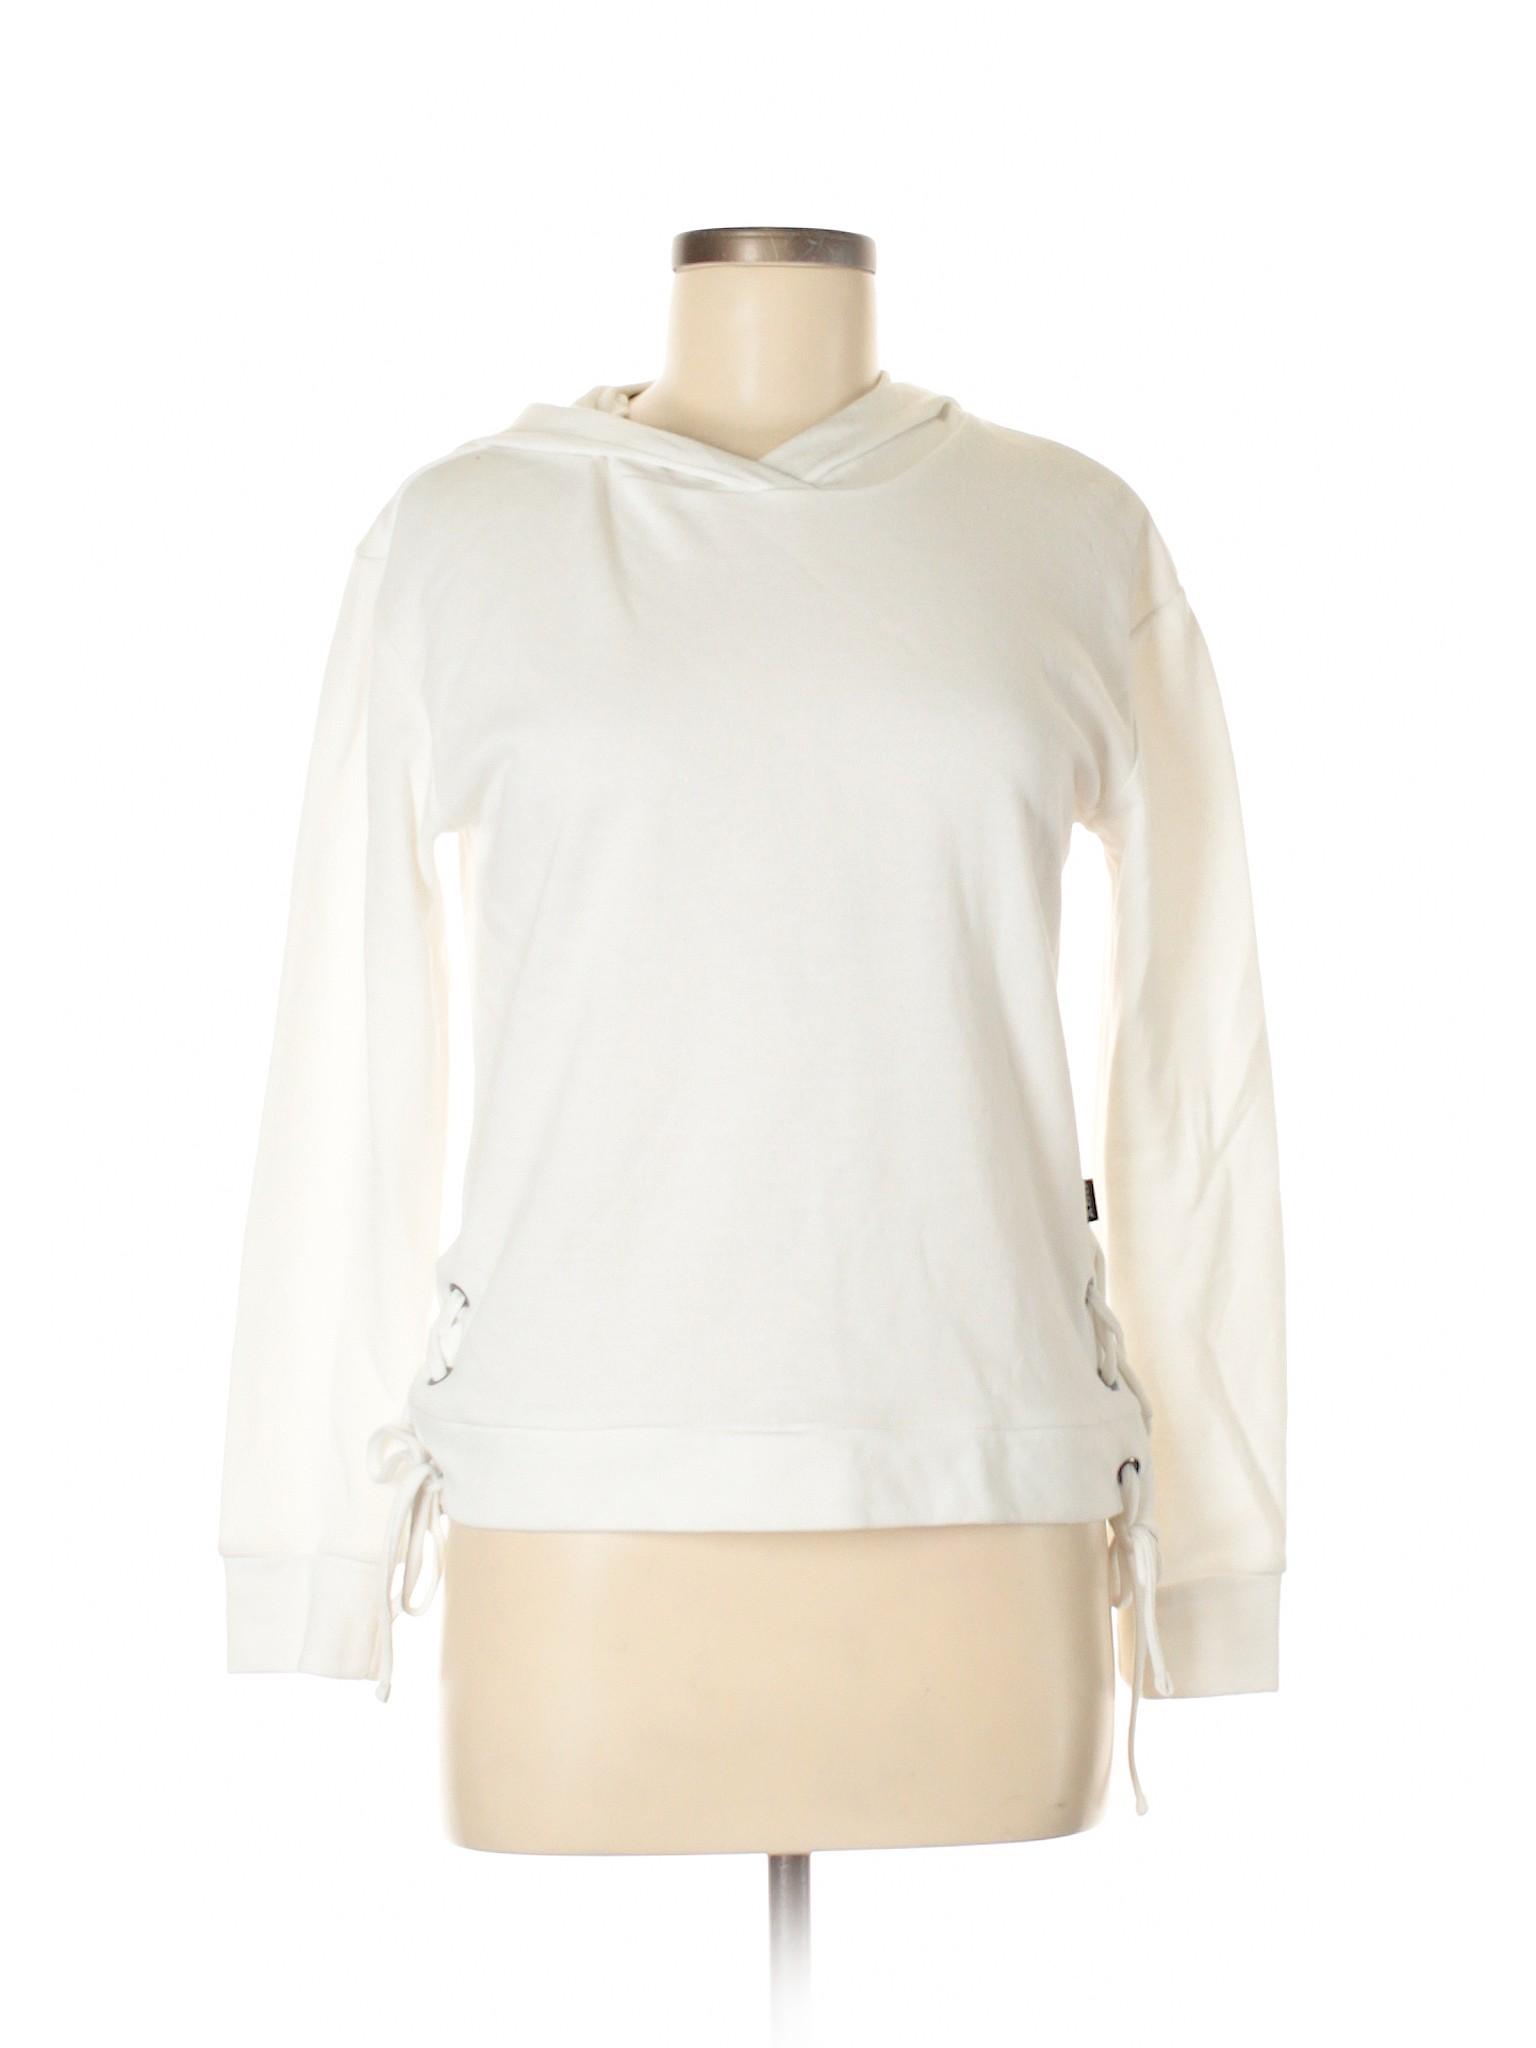 winter RBX Sweater Sweater Pullover winter Boutique winter Pullover Boutique RBX Boutique Boutique Sweater Pullover winter RBX paO4qWgg